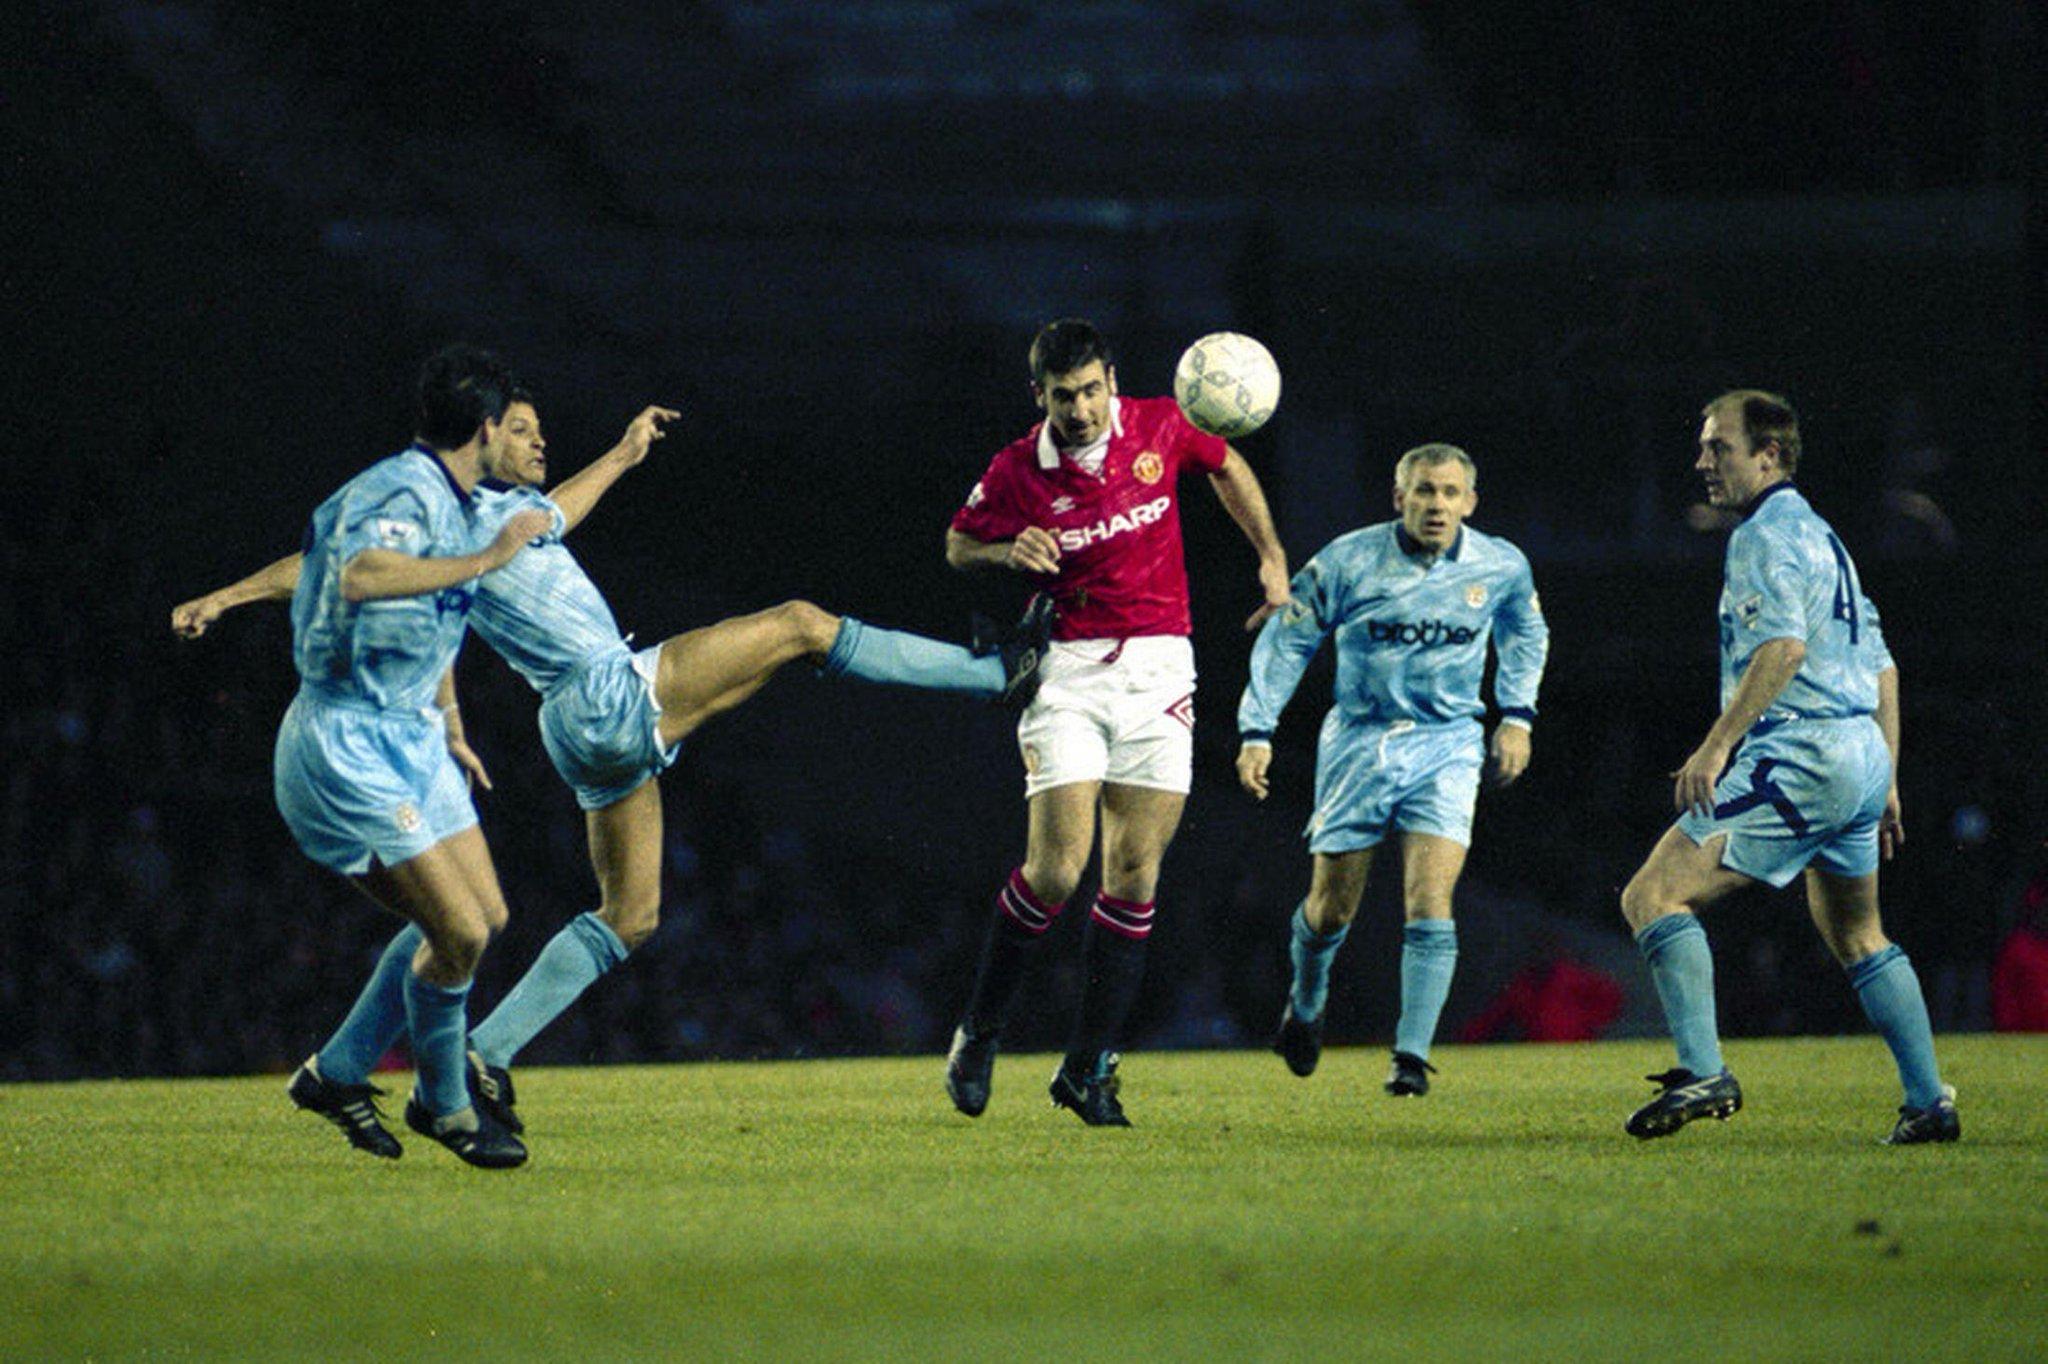 #OnThisDay 1992 | Eric Cantona melakoni partai debutnya ketika mengalahkan City 2-1 http://t.co/caYpIIzTBk